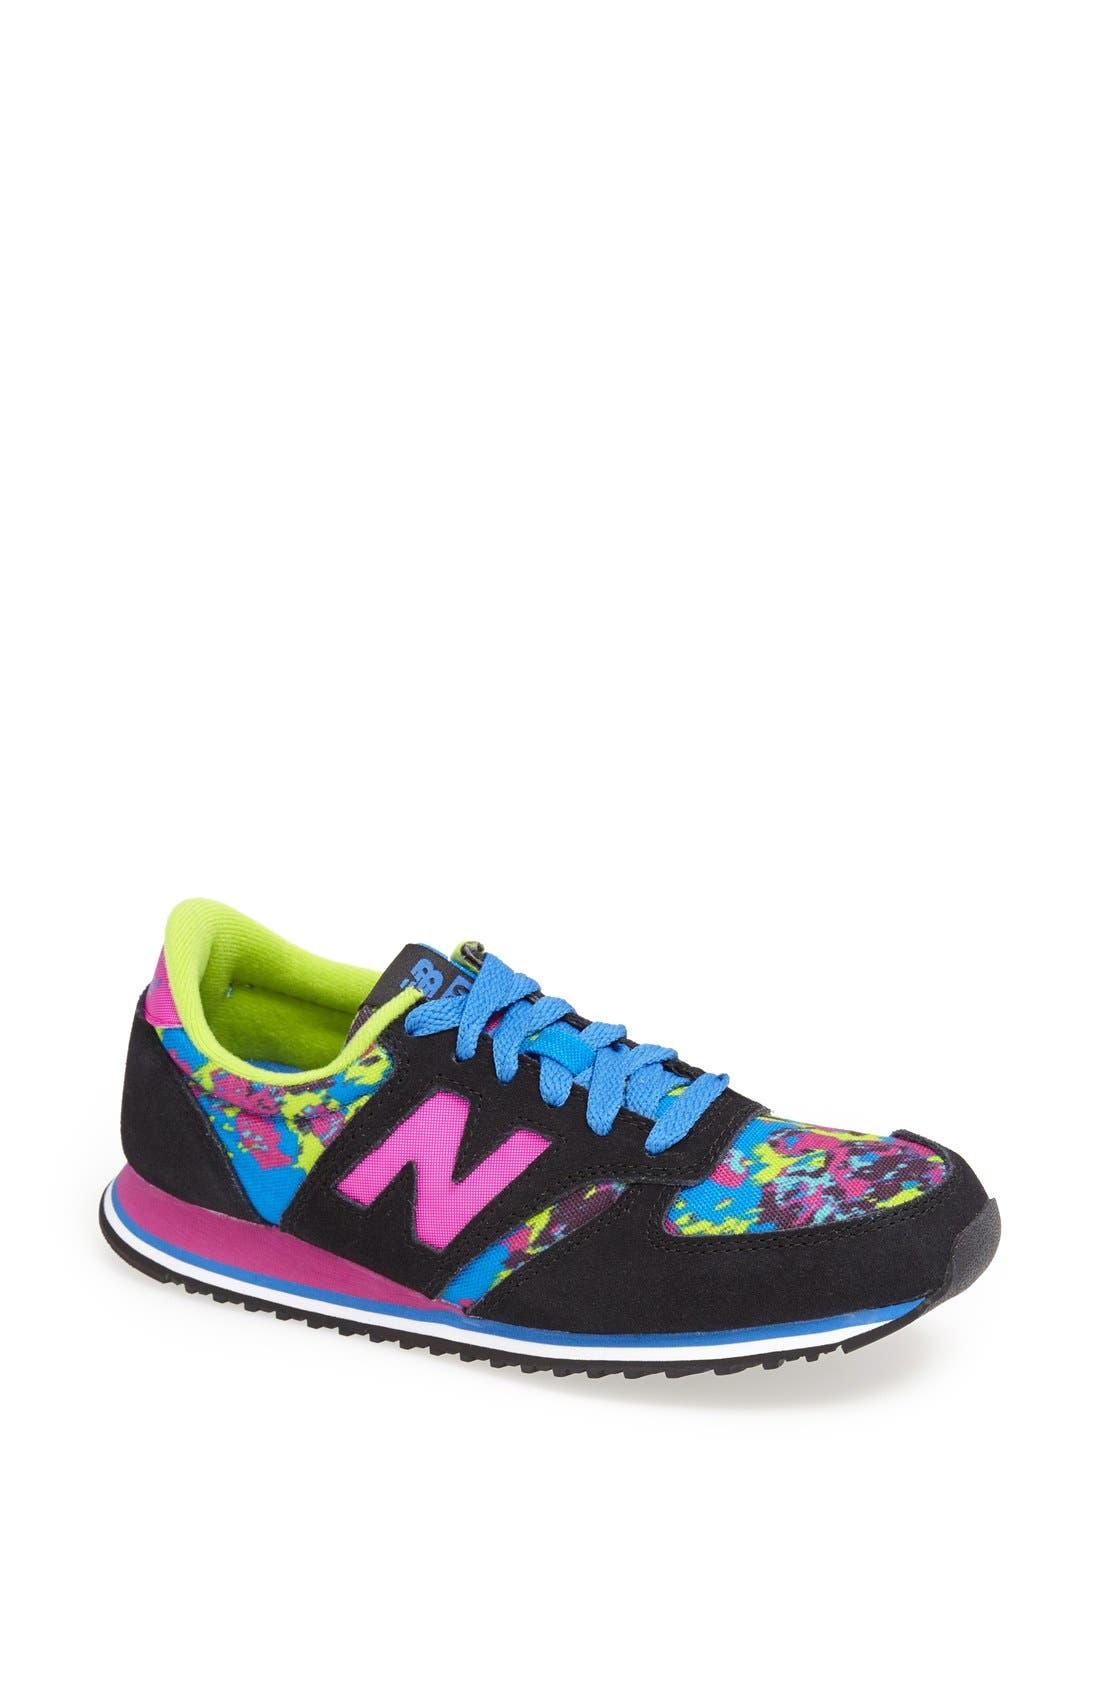 Main Image - New Balance '420 Tomboy' Sneaker (Women)